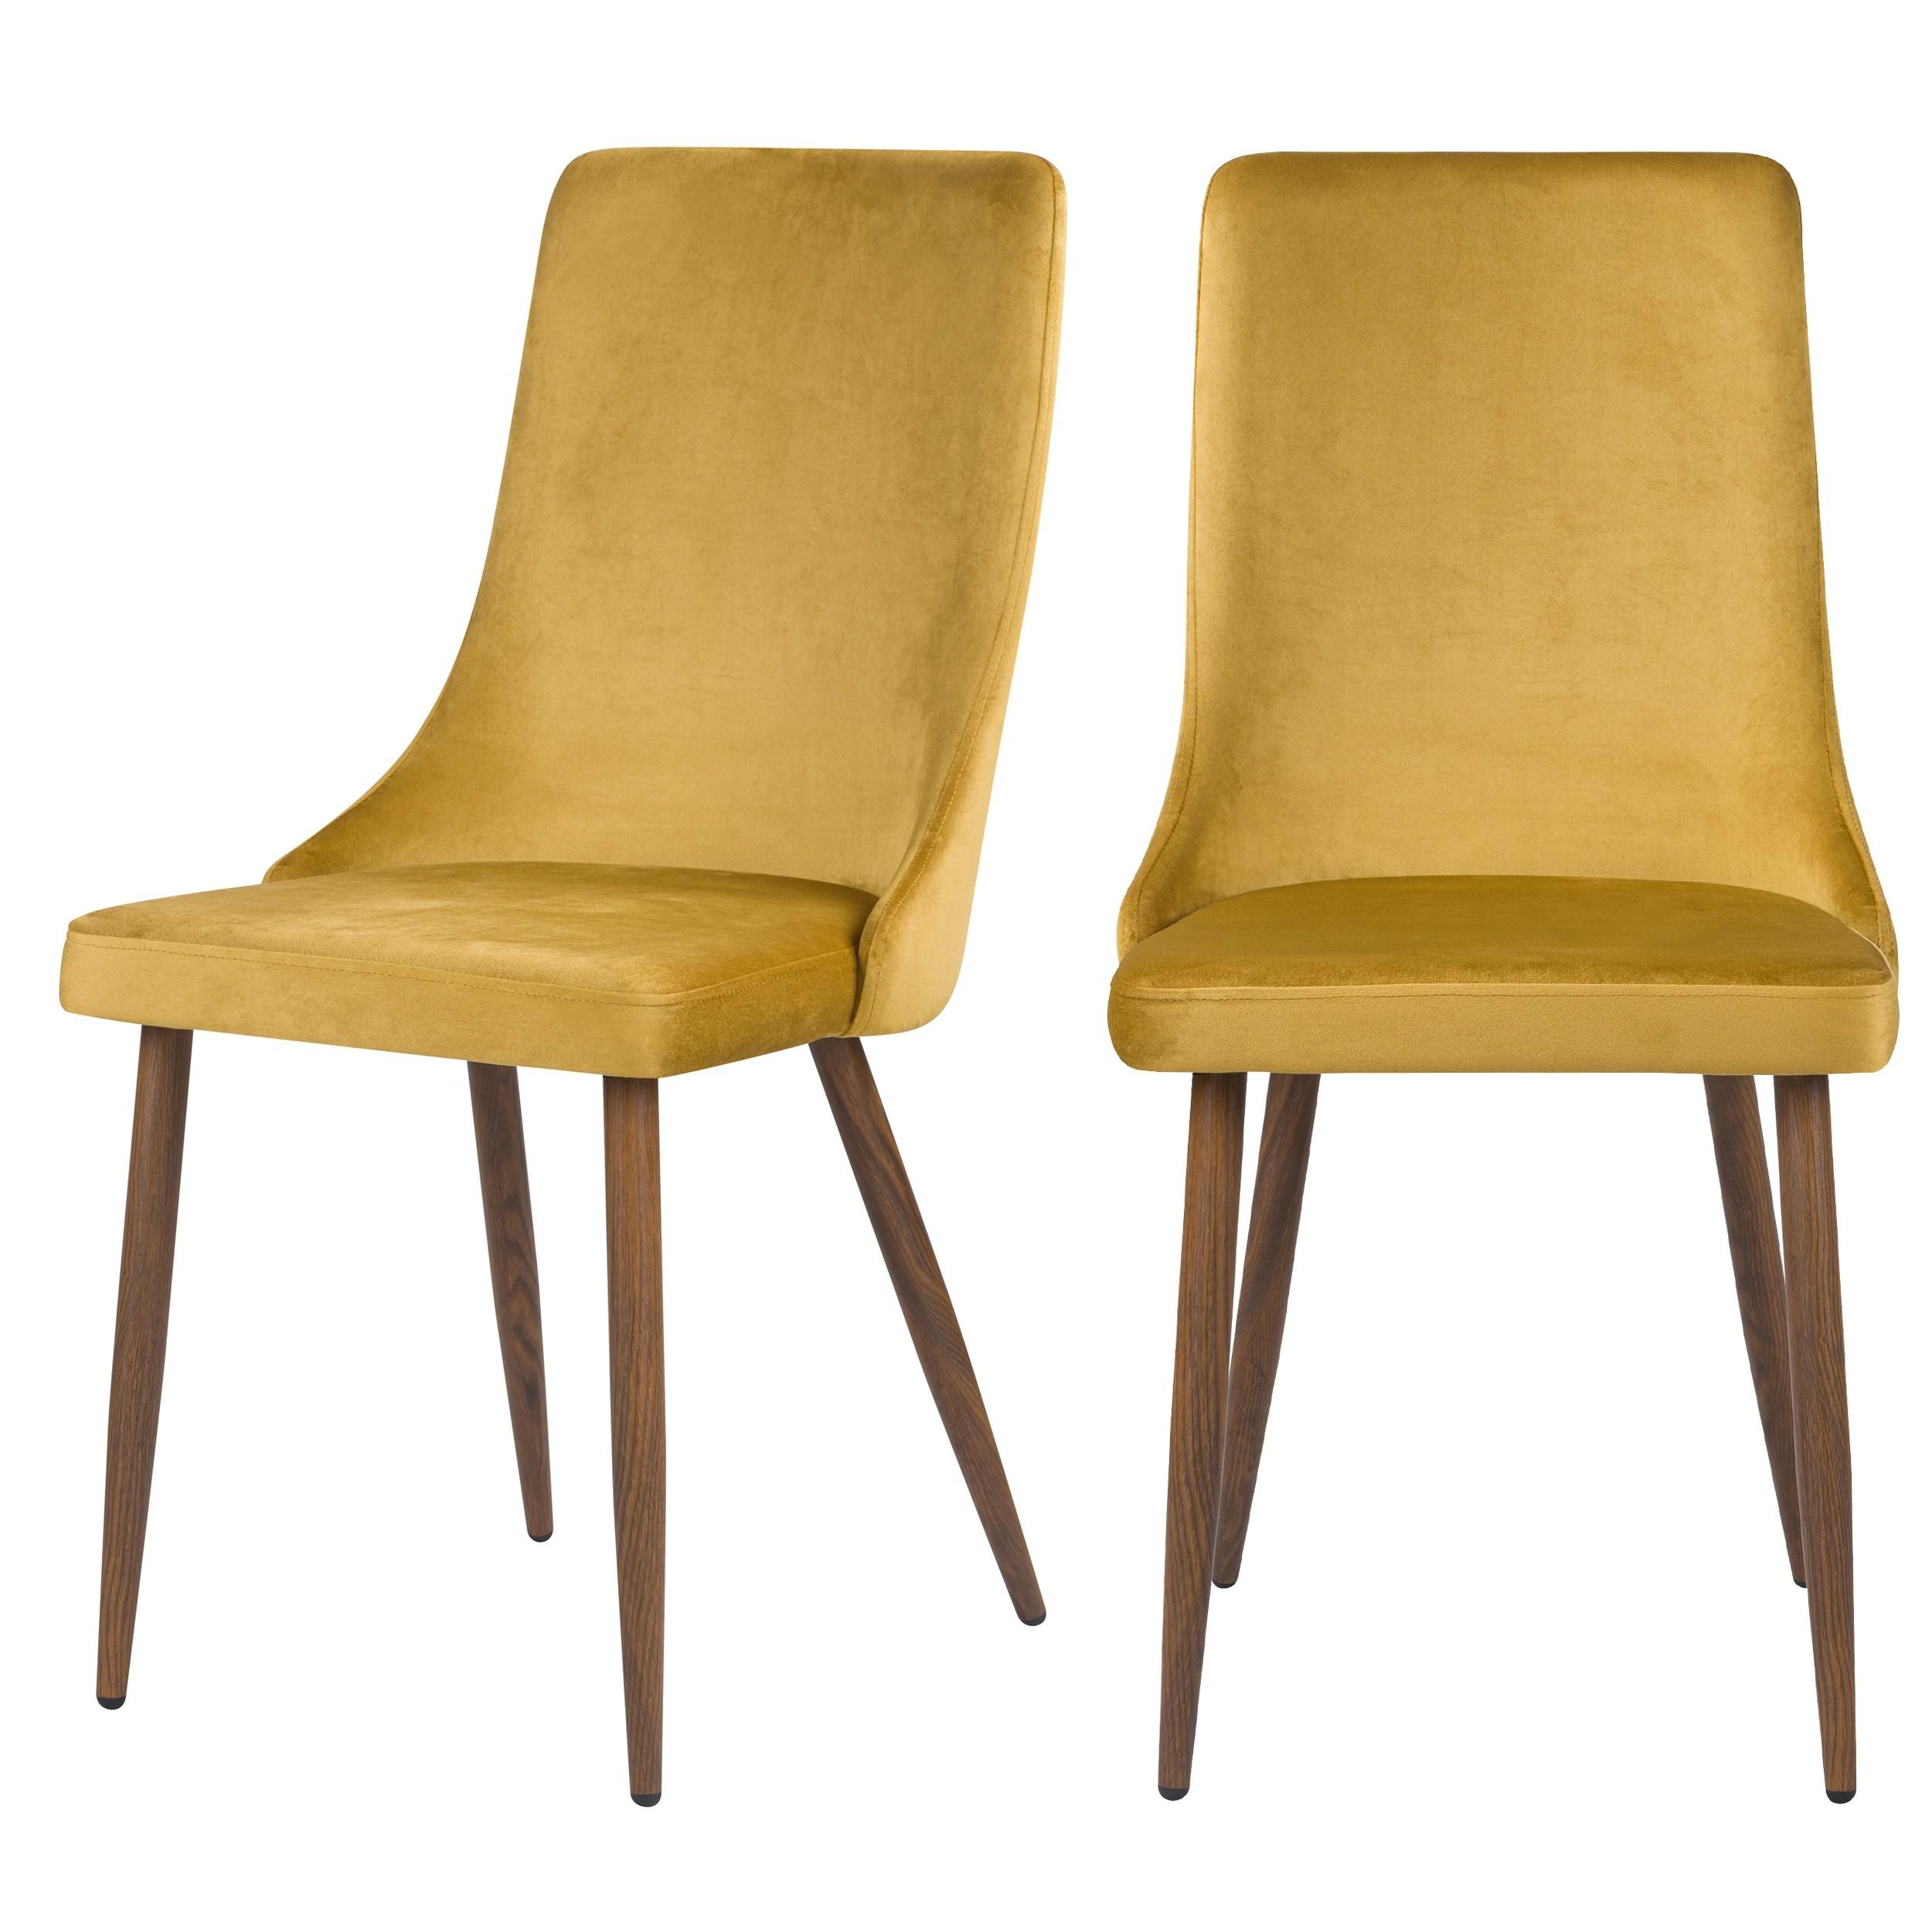 acheter chaises jaunes en velours